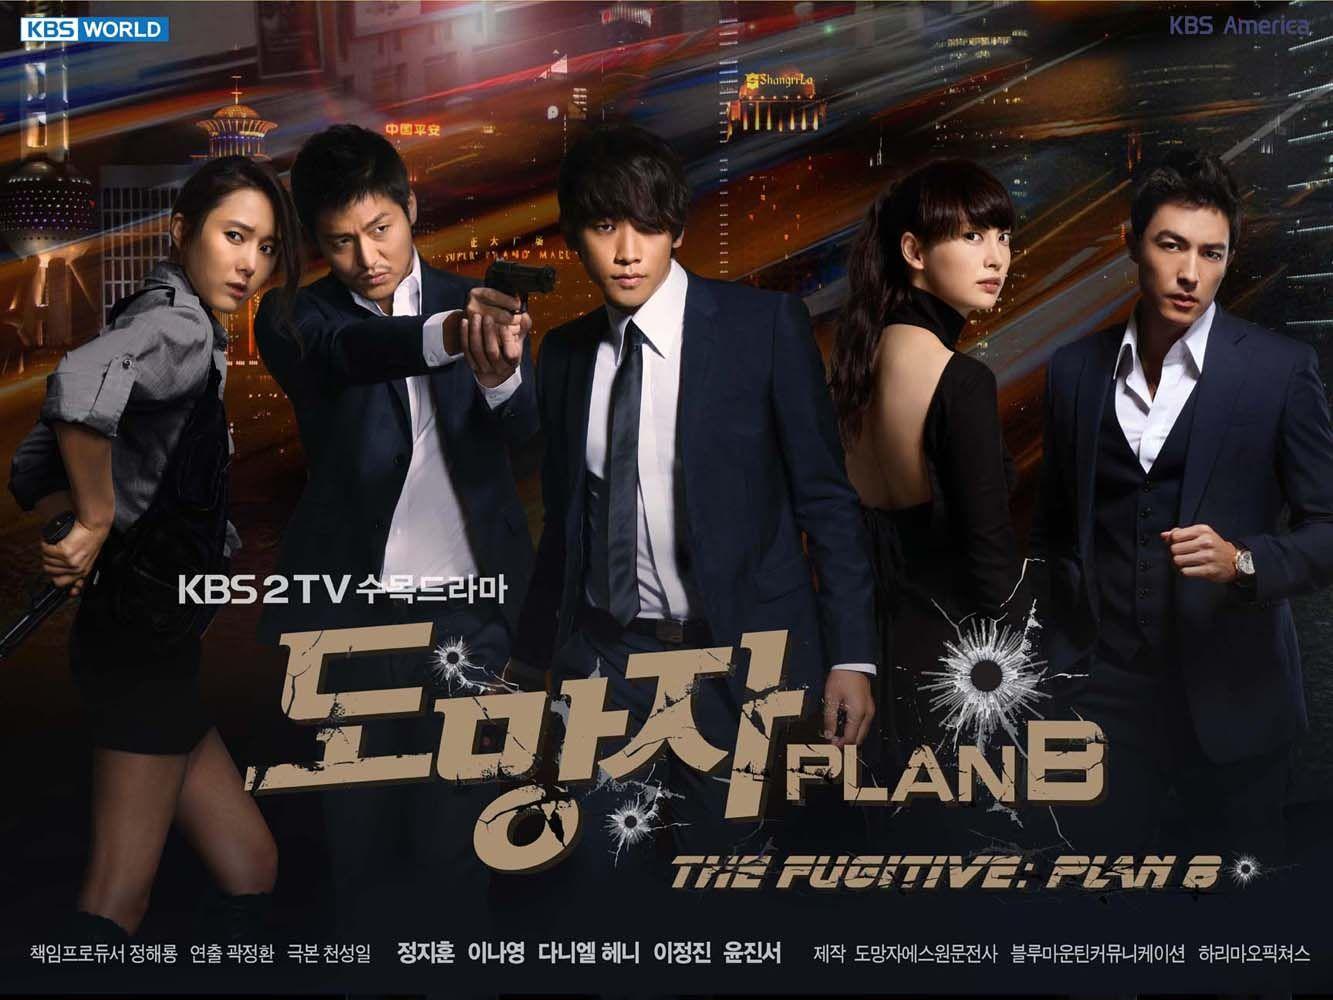 KBS Korea Korean Drama DVD English Subtitle The Fugitive Plan B 20